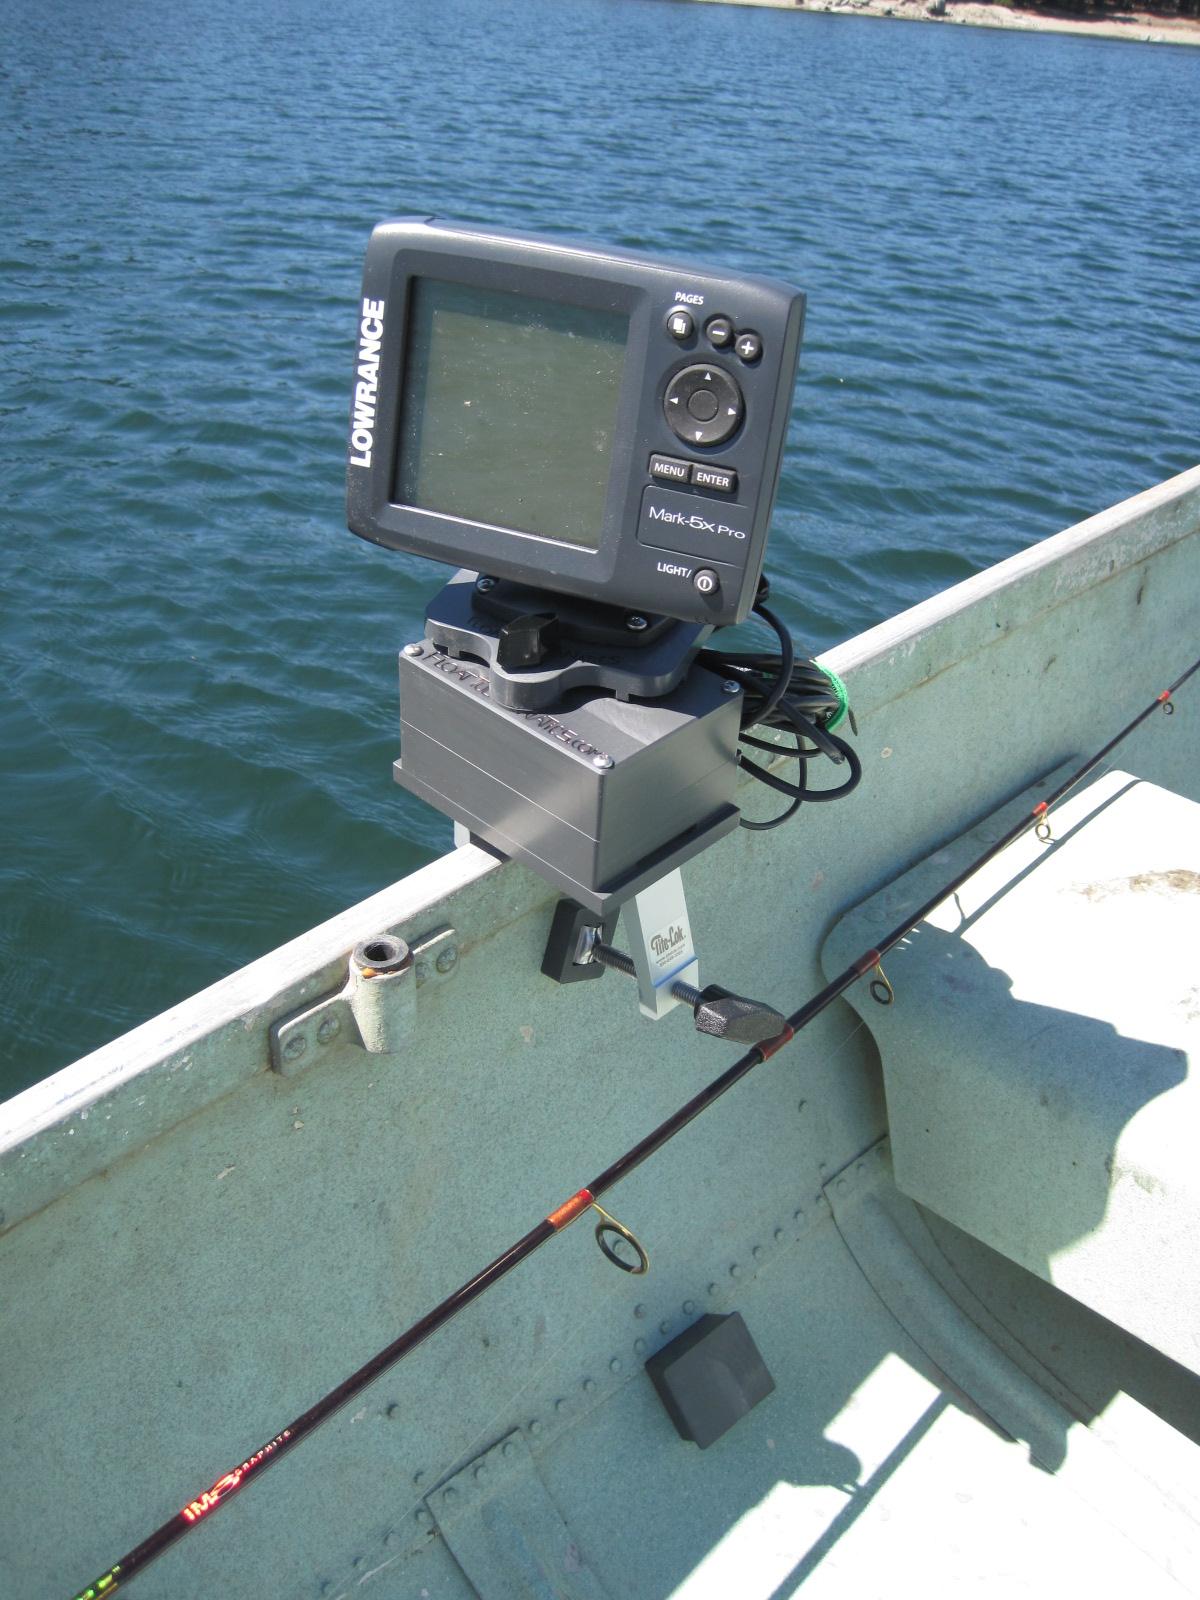 Photos of Fishfinders installed on boats, float tubes, kayaks, etc